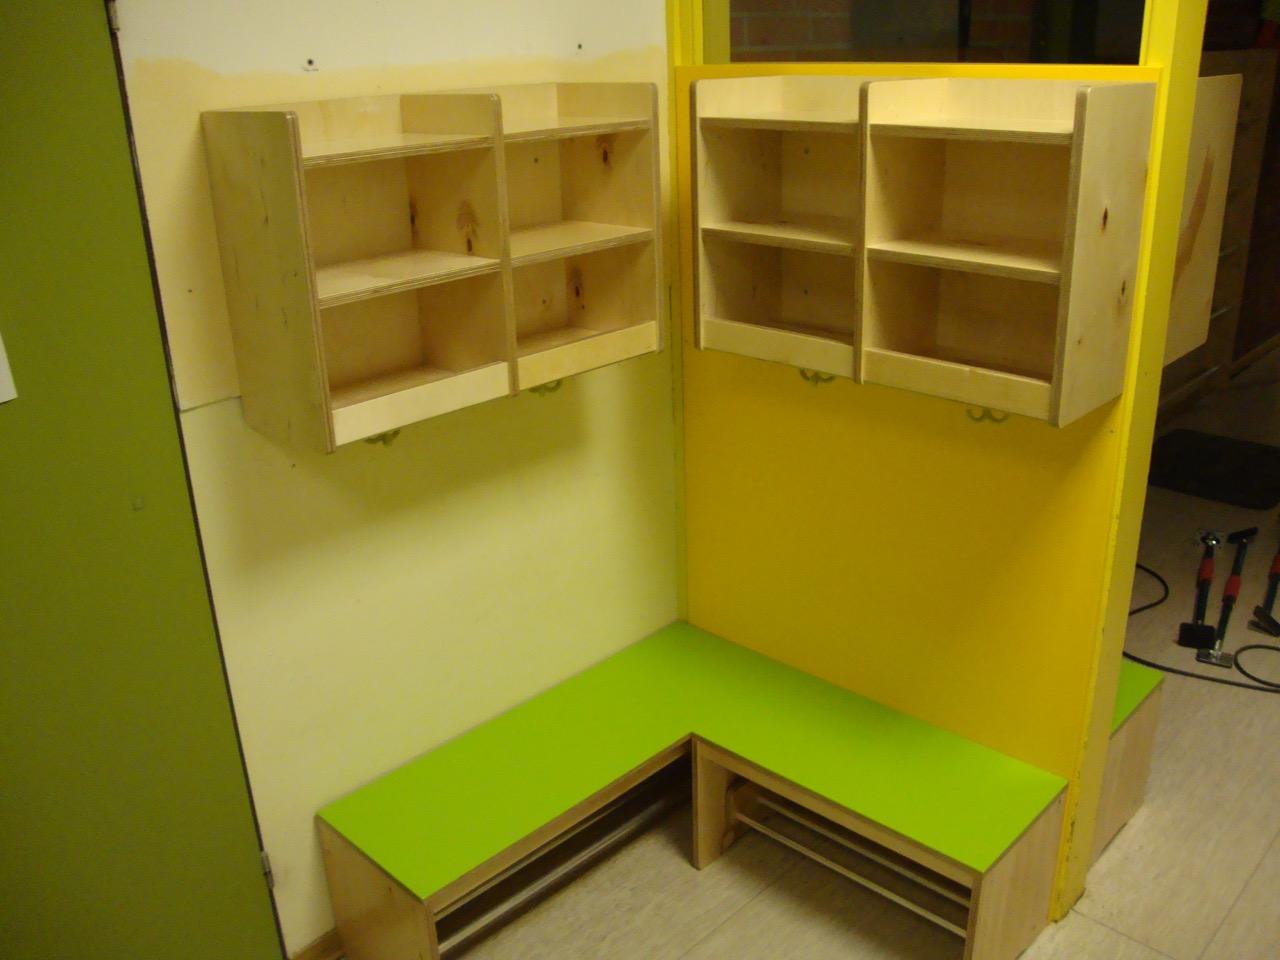 metallarbeiten tischlerei holzwerkstatt helmeke. Black Bedroom Furniture Sets. Home Design Ideas